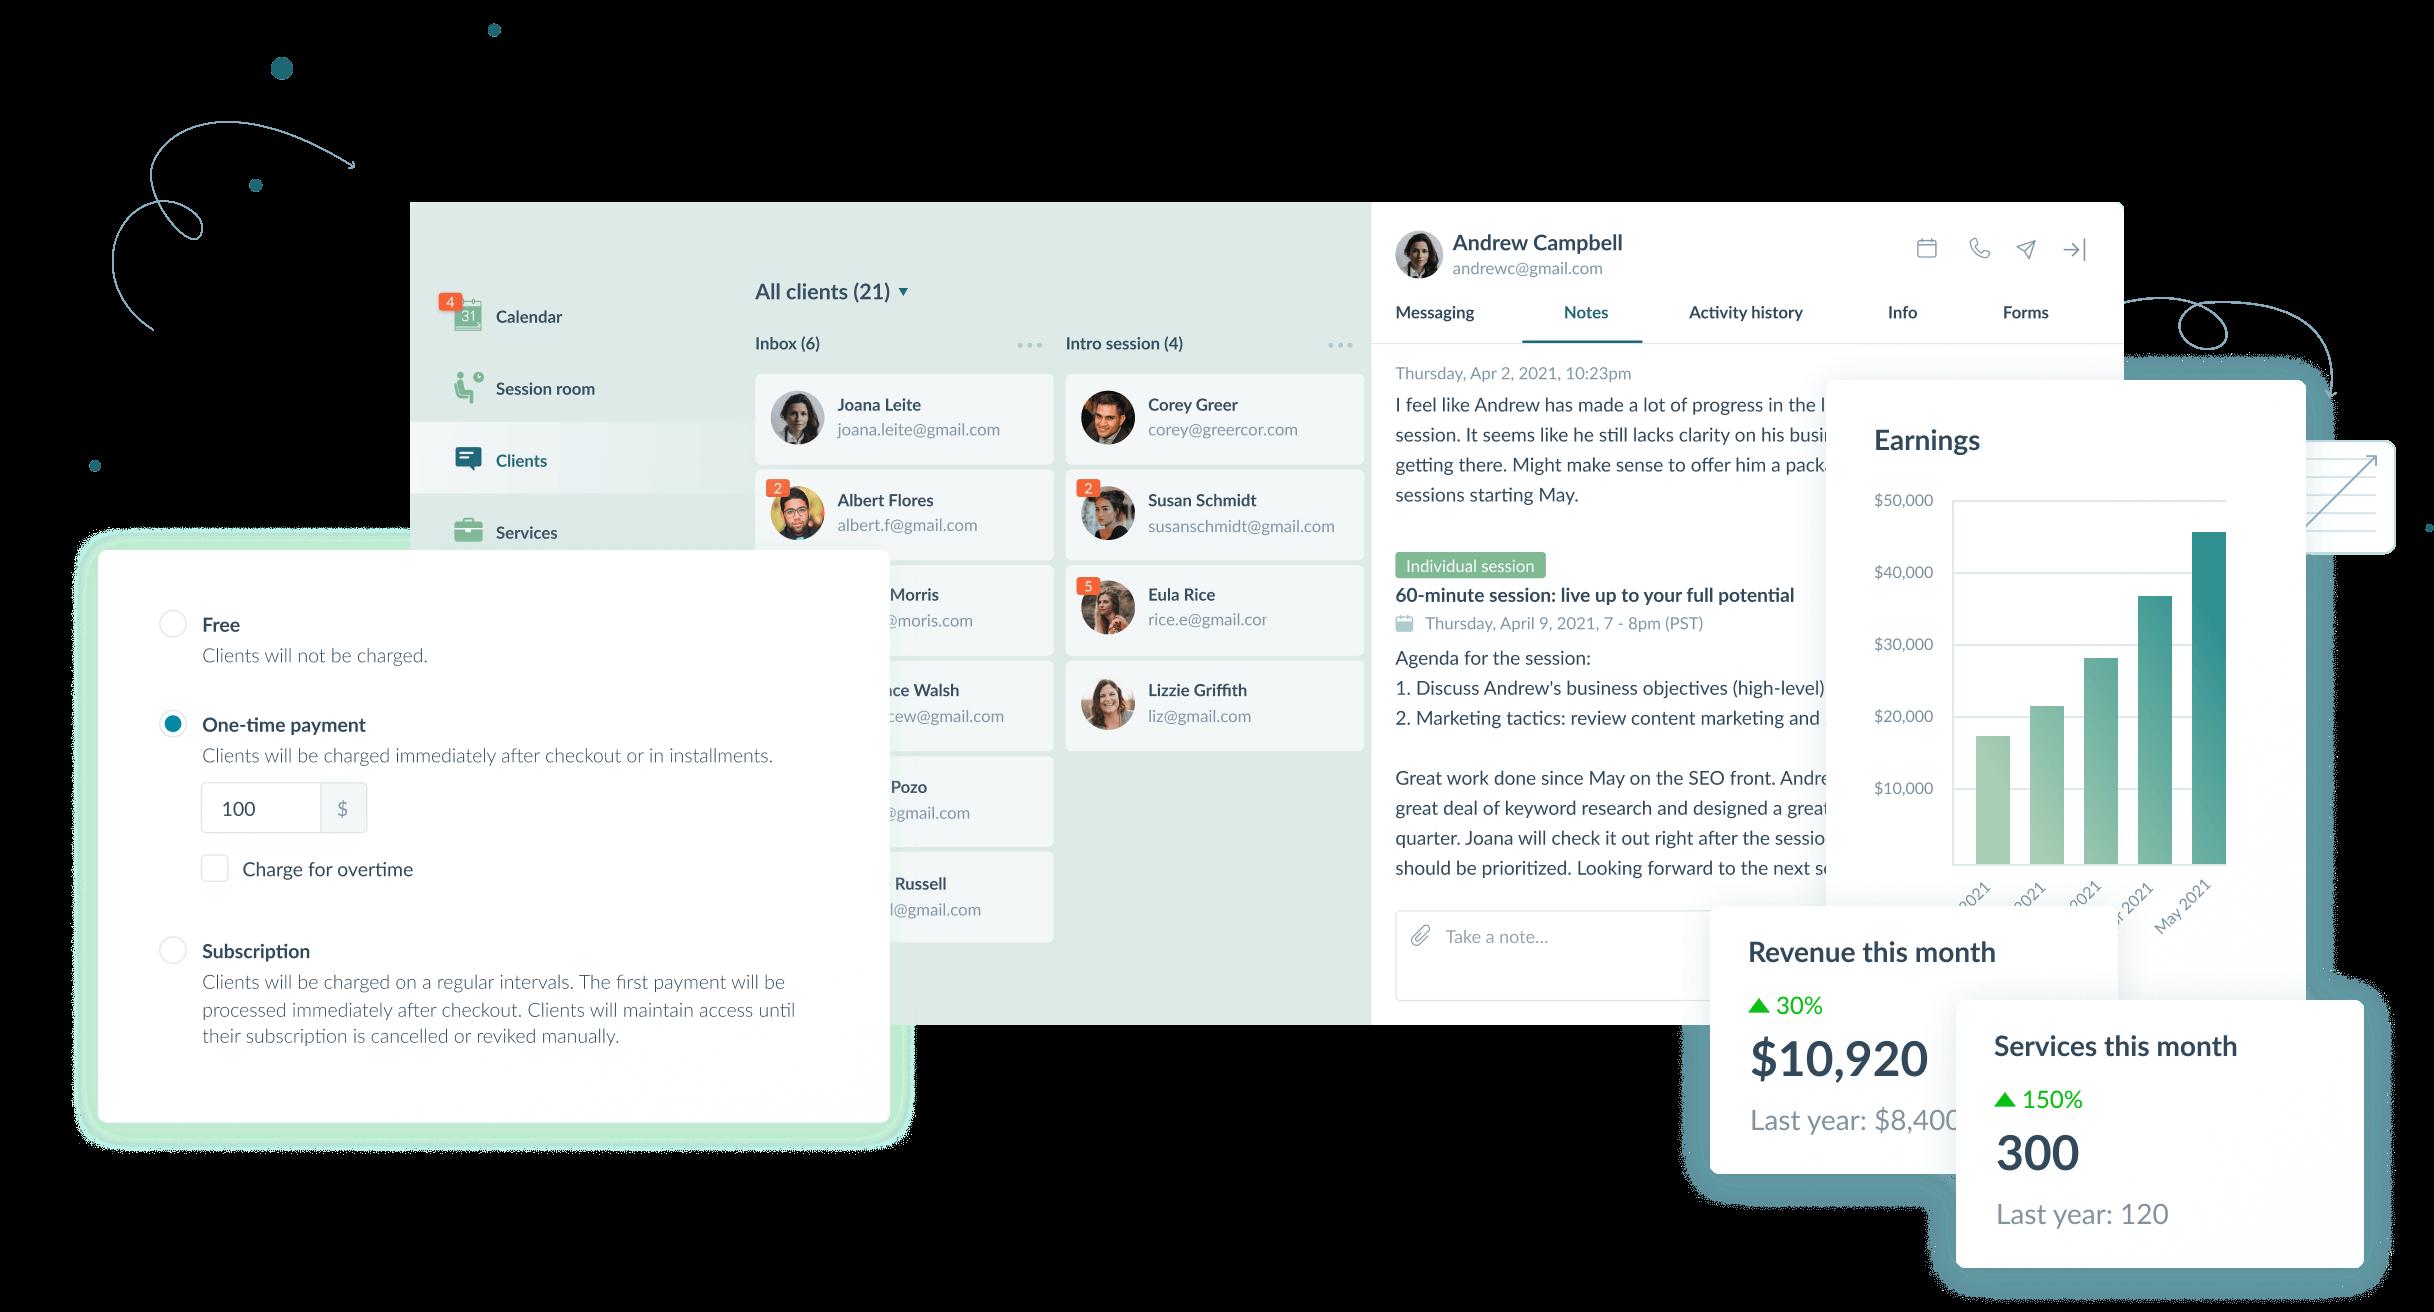 Tackle admin tasks through automation